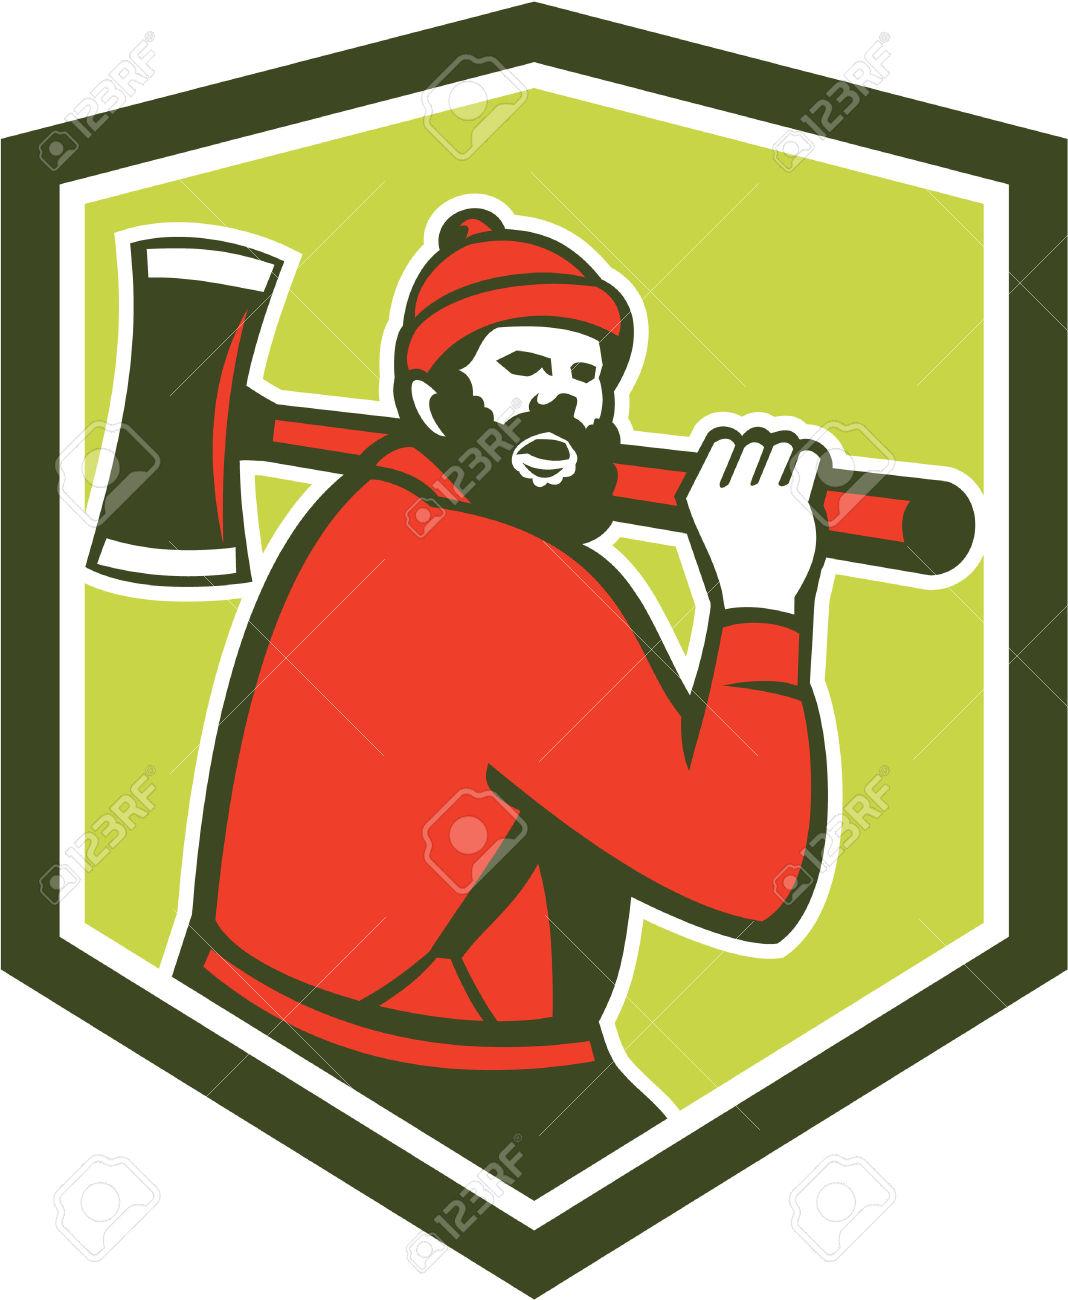 Illustration Of Paul Bunyan A Lumberjack Sawyer Forest Worker.